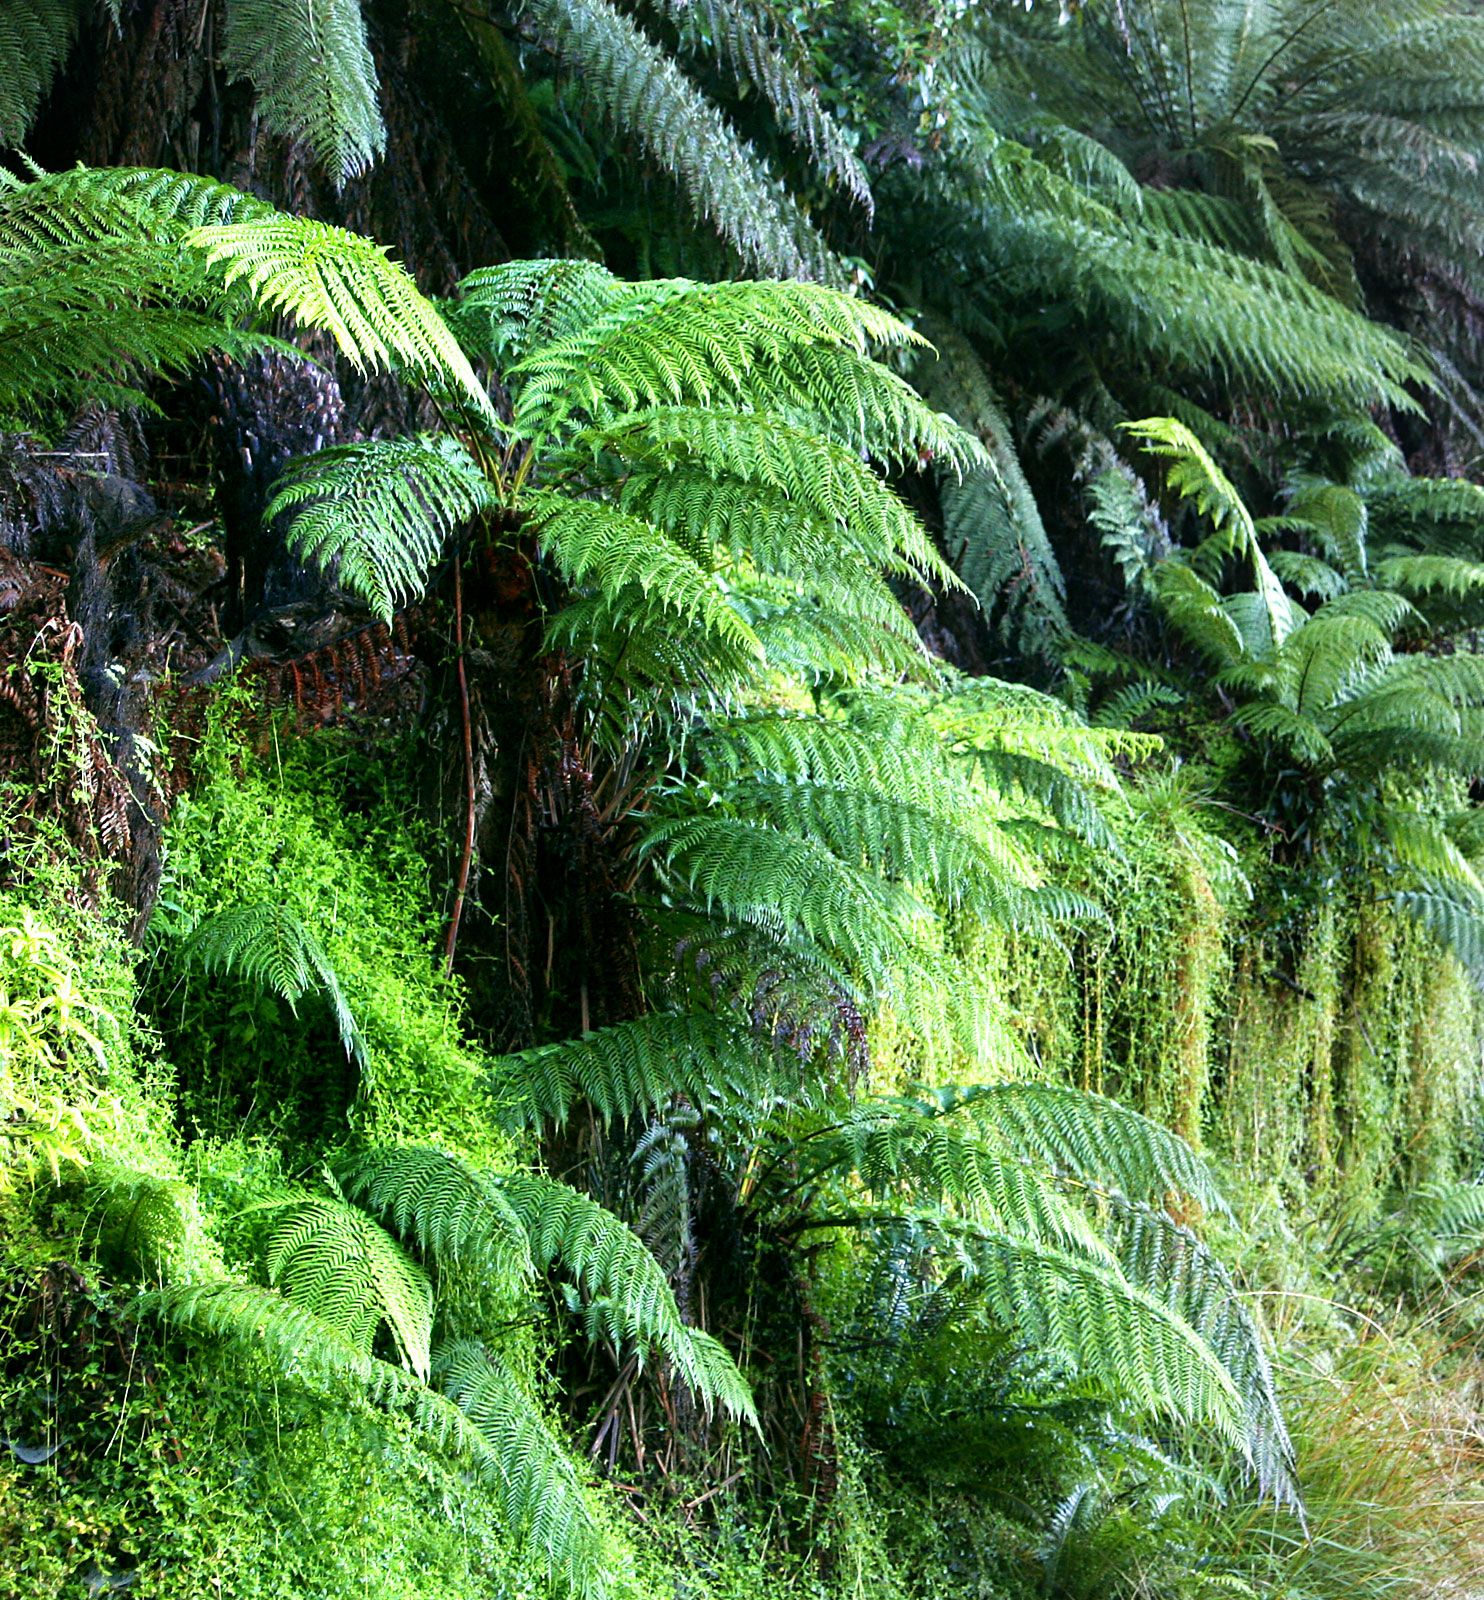 Dicksonia antarctica, a species of tree fern